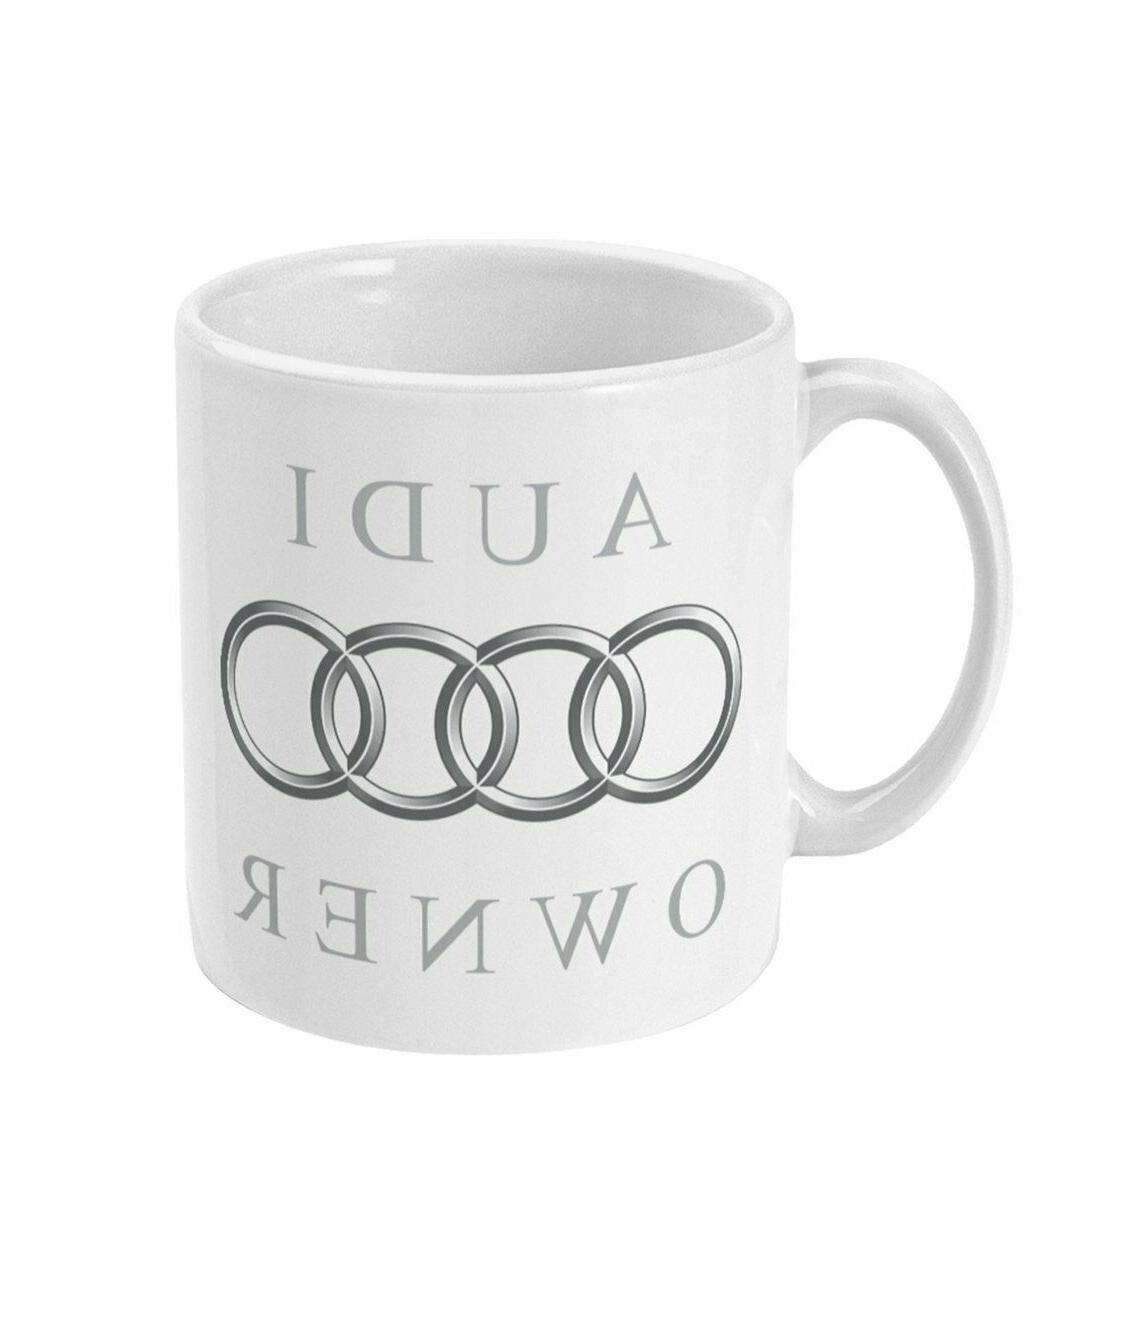 Audi Owner Coffee Tea Drink Mug Ceramic Funny Cute Cup Gift